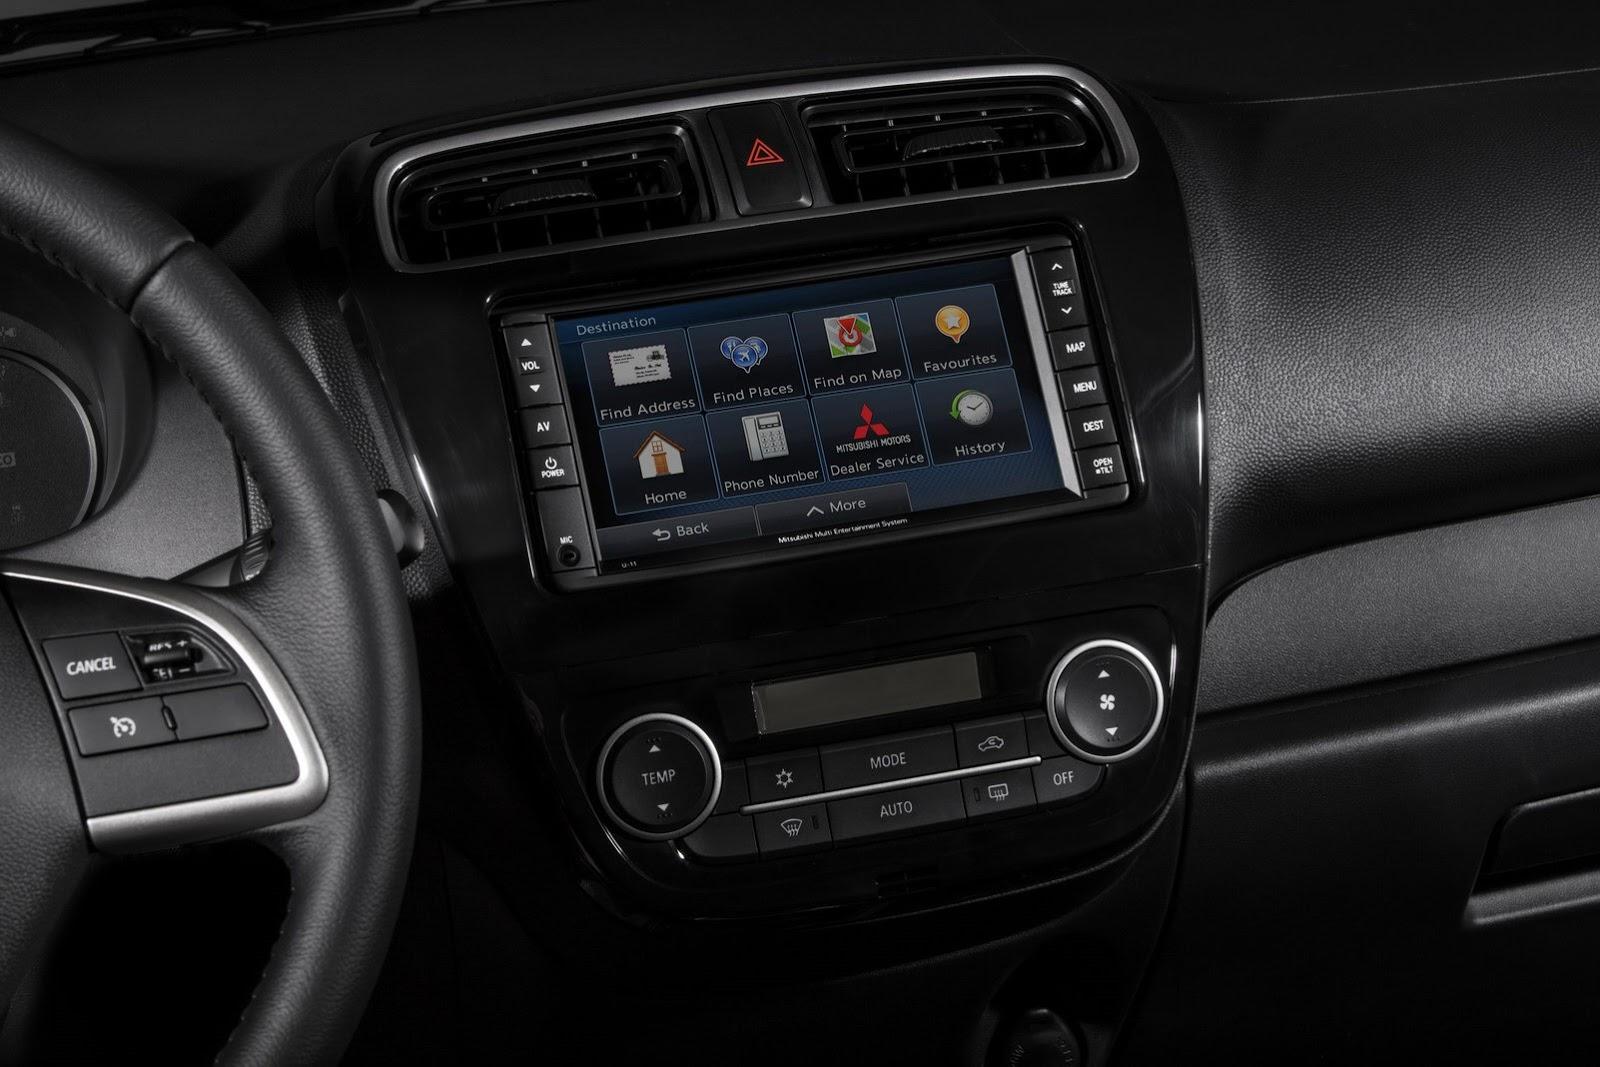 2014 Mitsubishi Mirage Makes Us Debut In New York